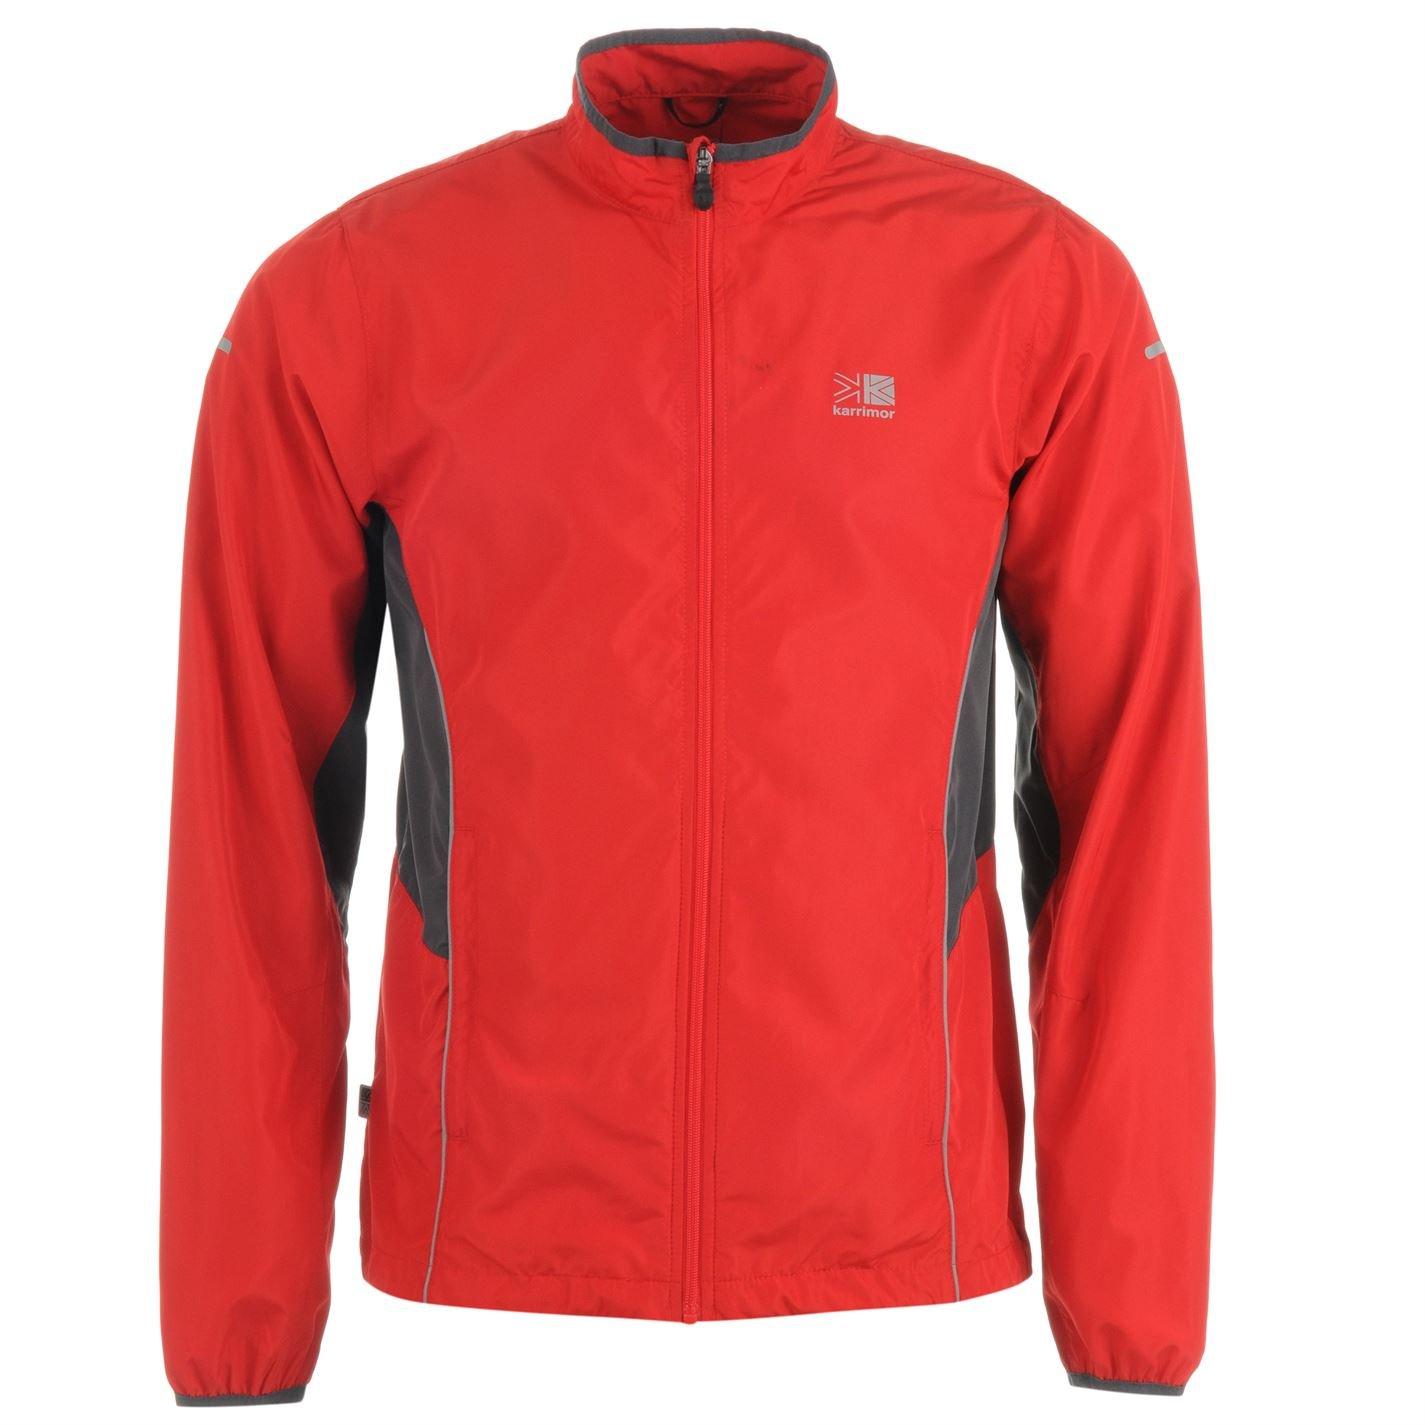 Karrimor Mens Running Jacket Jogging Long Sleeve Zip Fastening Coat Top Red Small